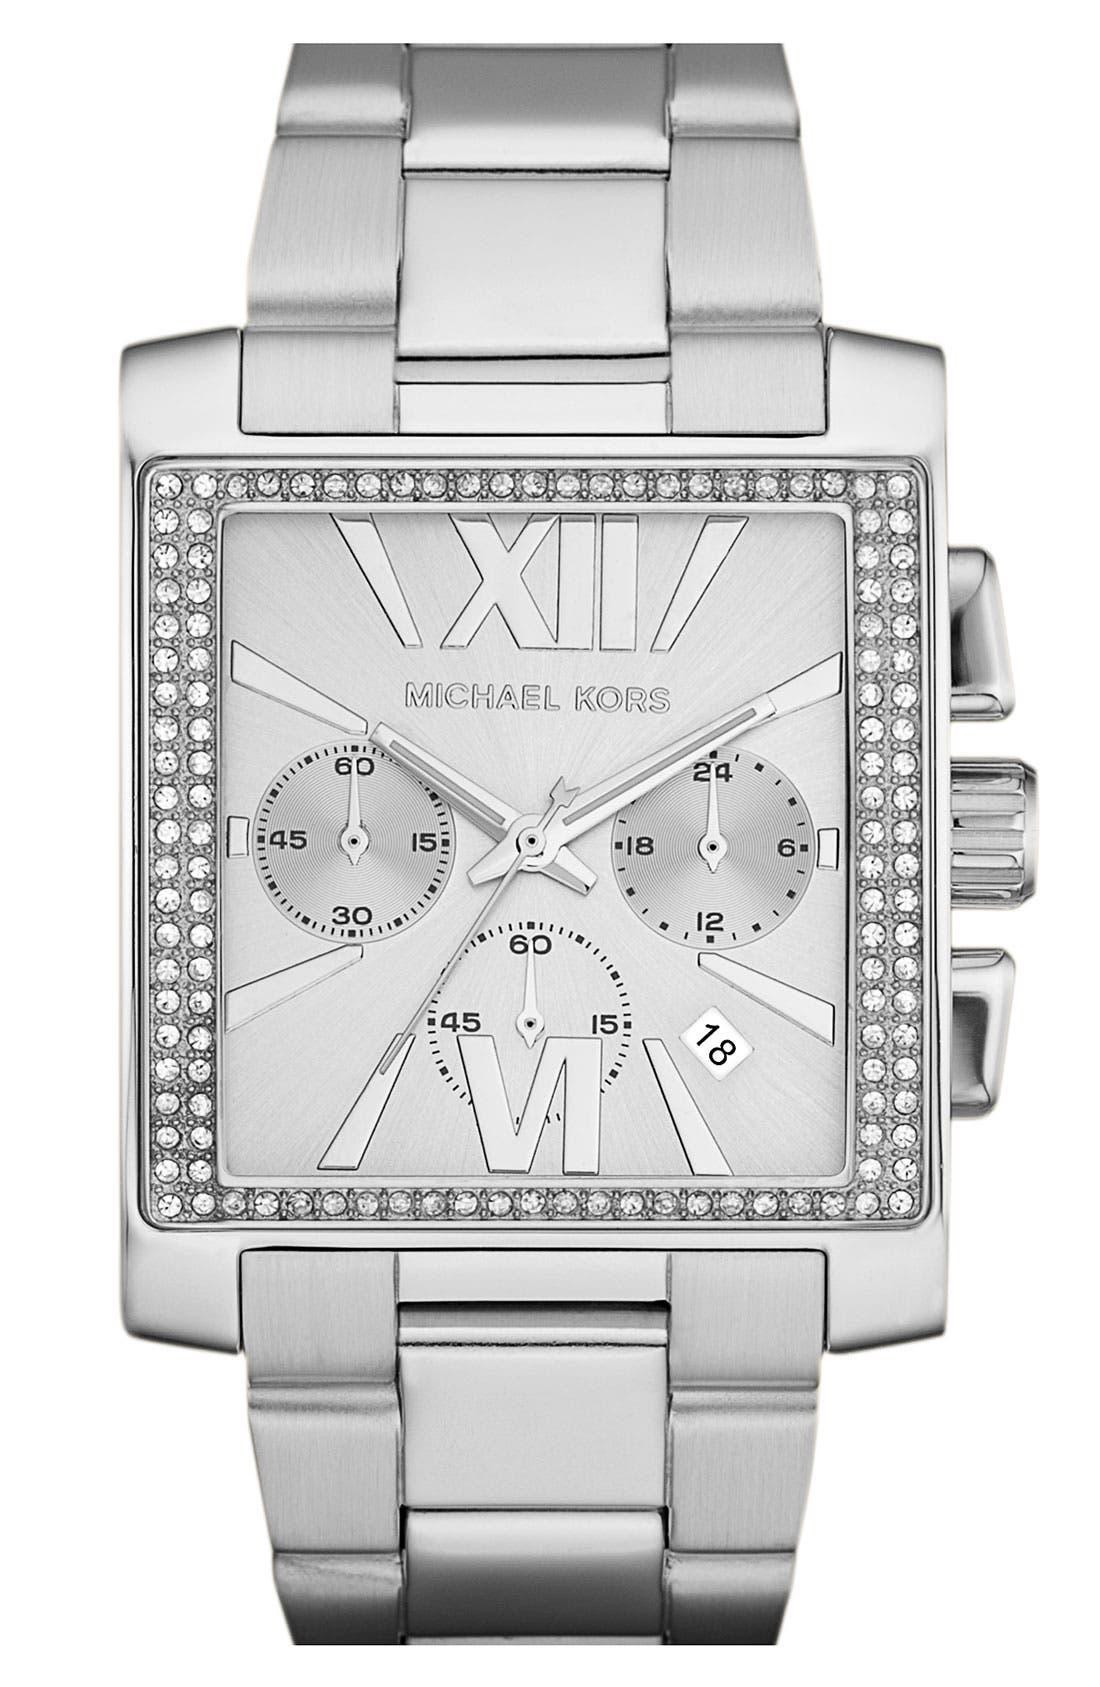 Main Image - Michael Kors 'Gia' Chronograph Bracelet Watch